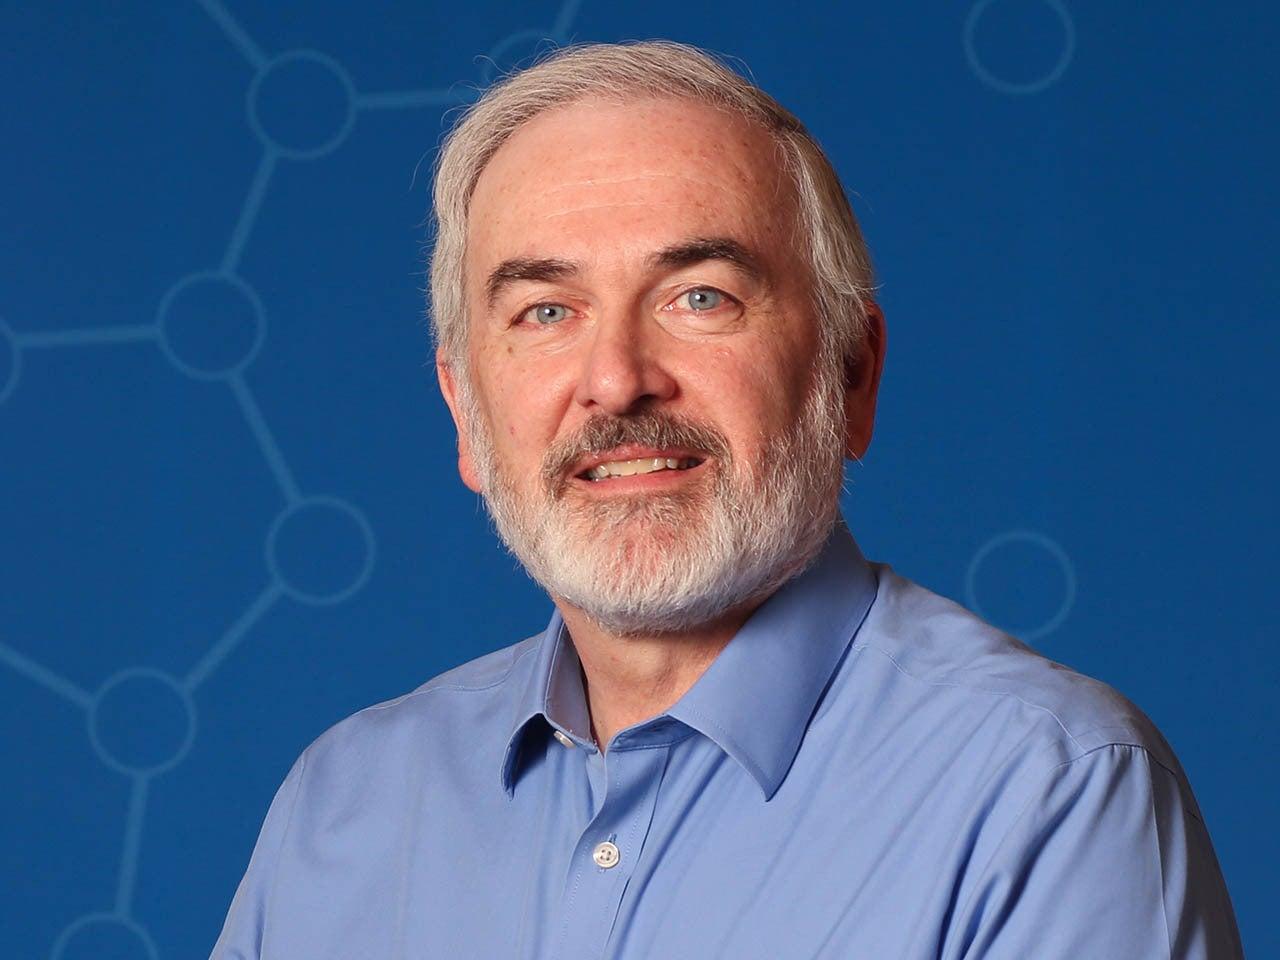 Adrian R. Krainer